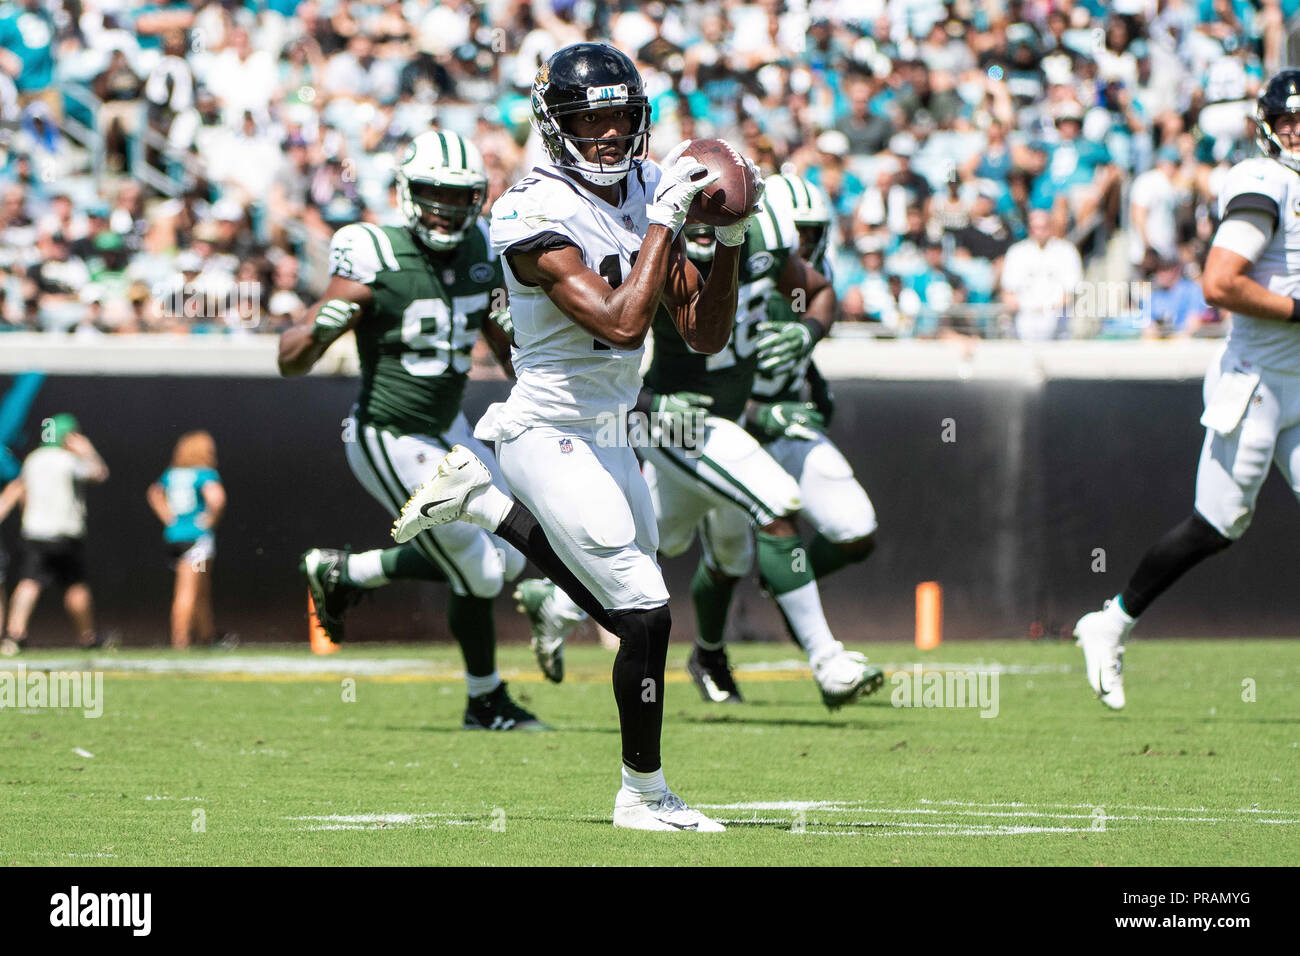 Jacksonville, FL, USA. 30th Sep, 2018. Jacksonville Jaguars Wide Receiver  Dede Westbrook (12) During 1st Half NFL Football Game Between The New York  Jets ...